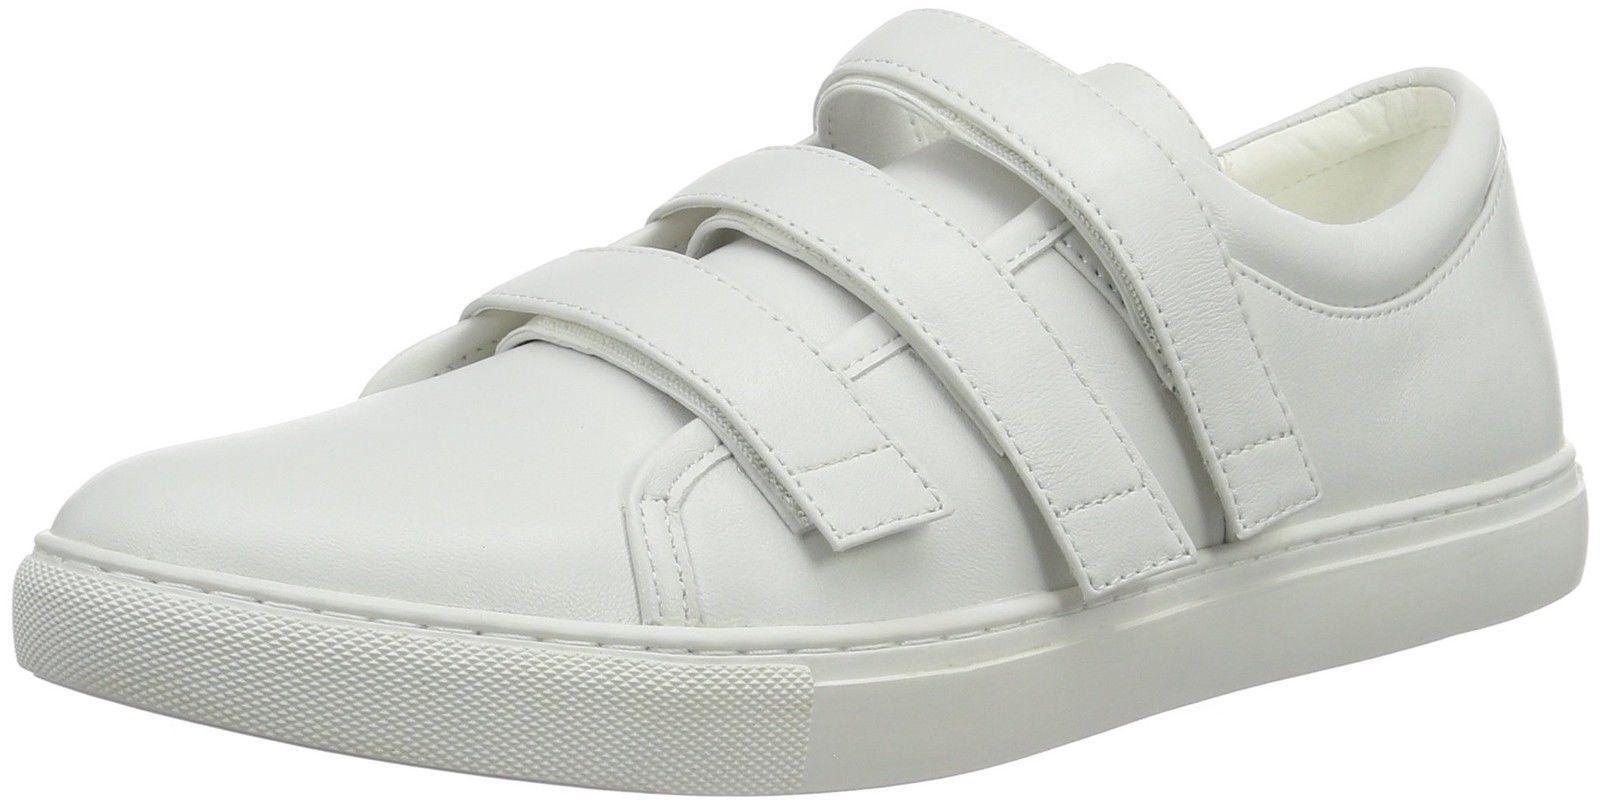 Kenneth Cole New York Women's Kingvel Low-Top Sneaker, White, Size 9.5 Med, $120